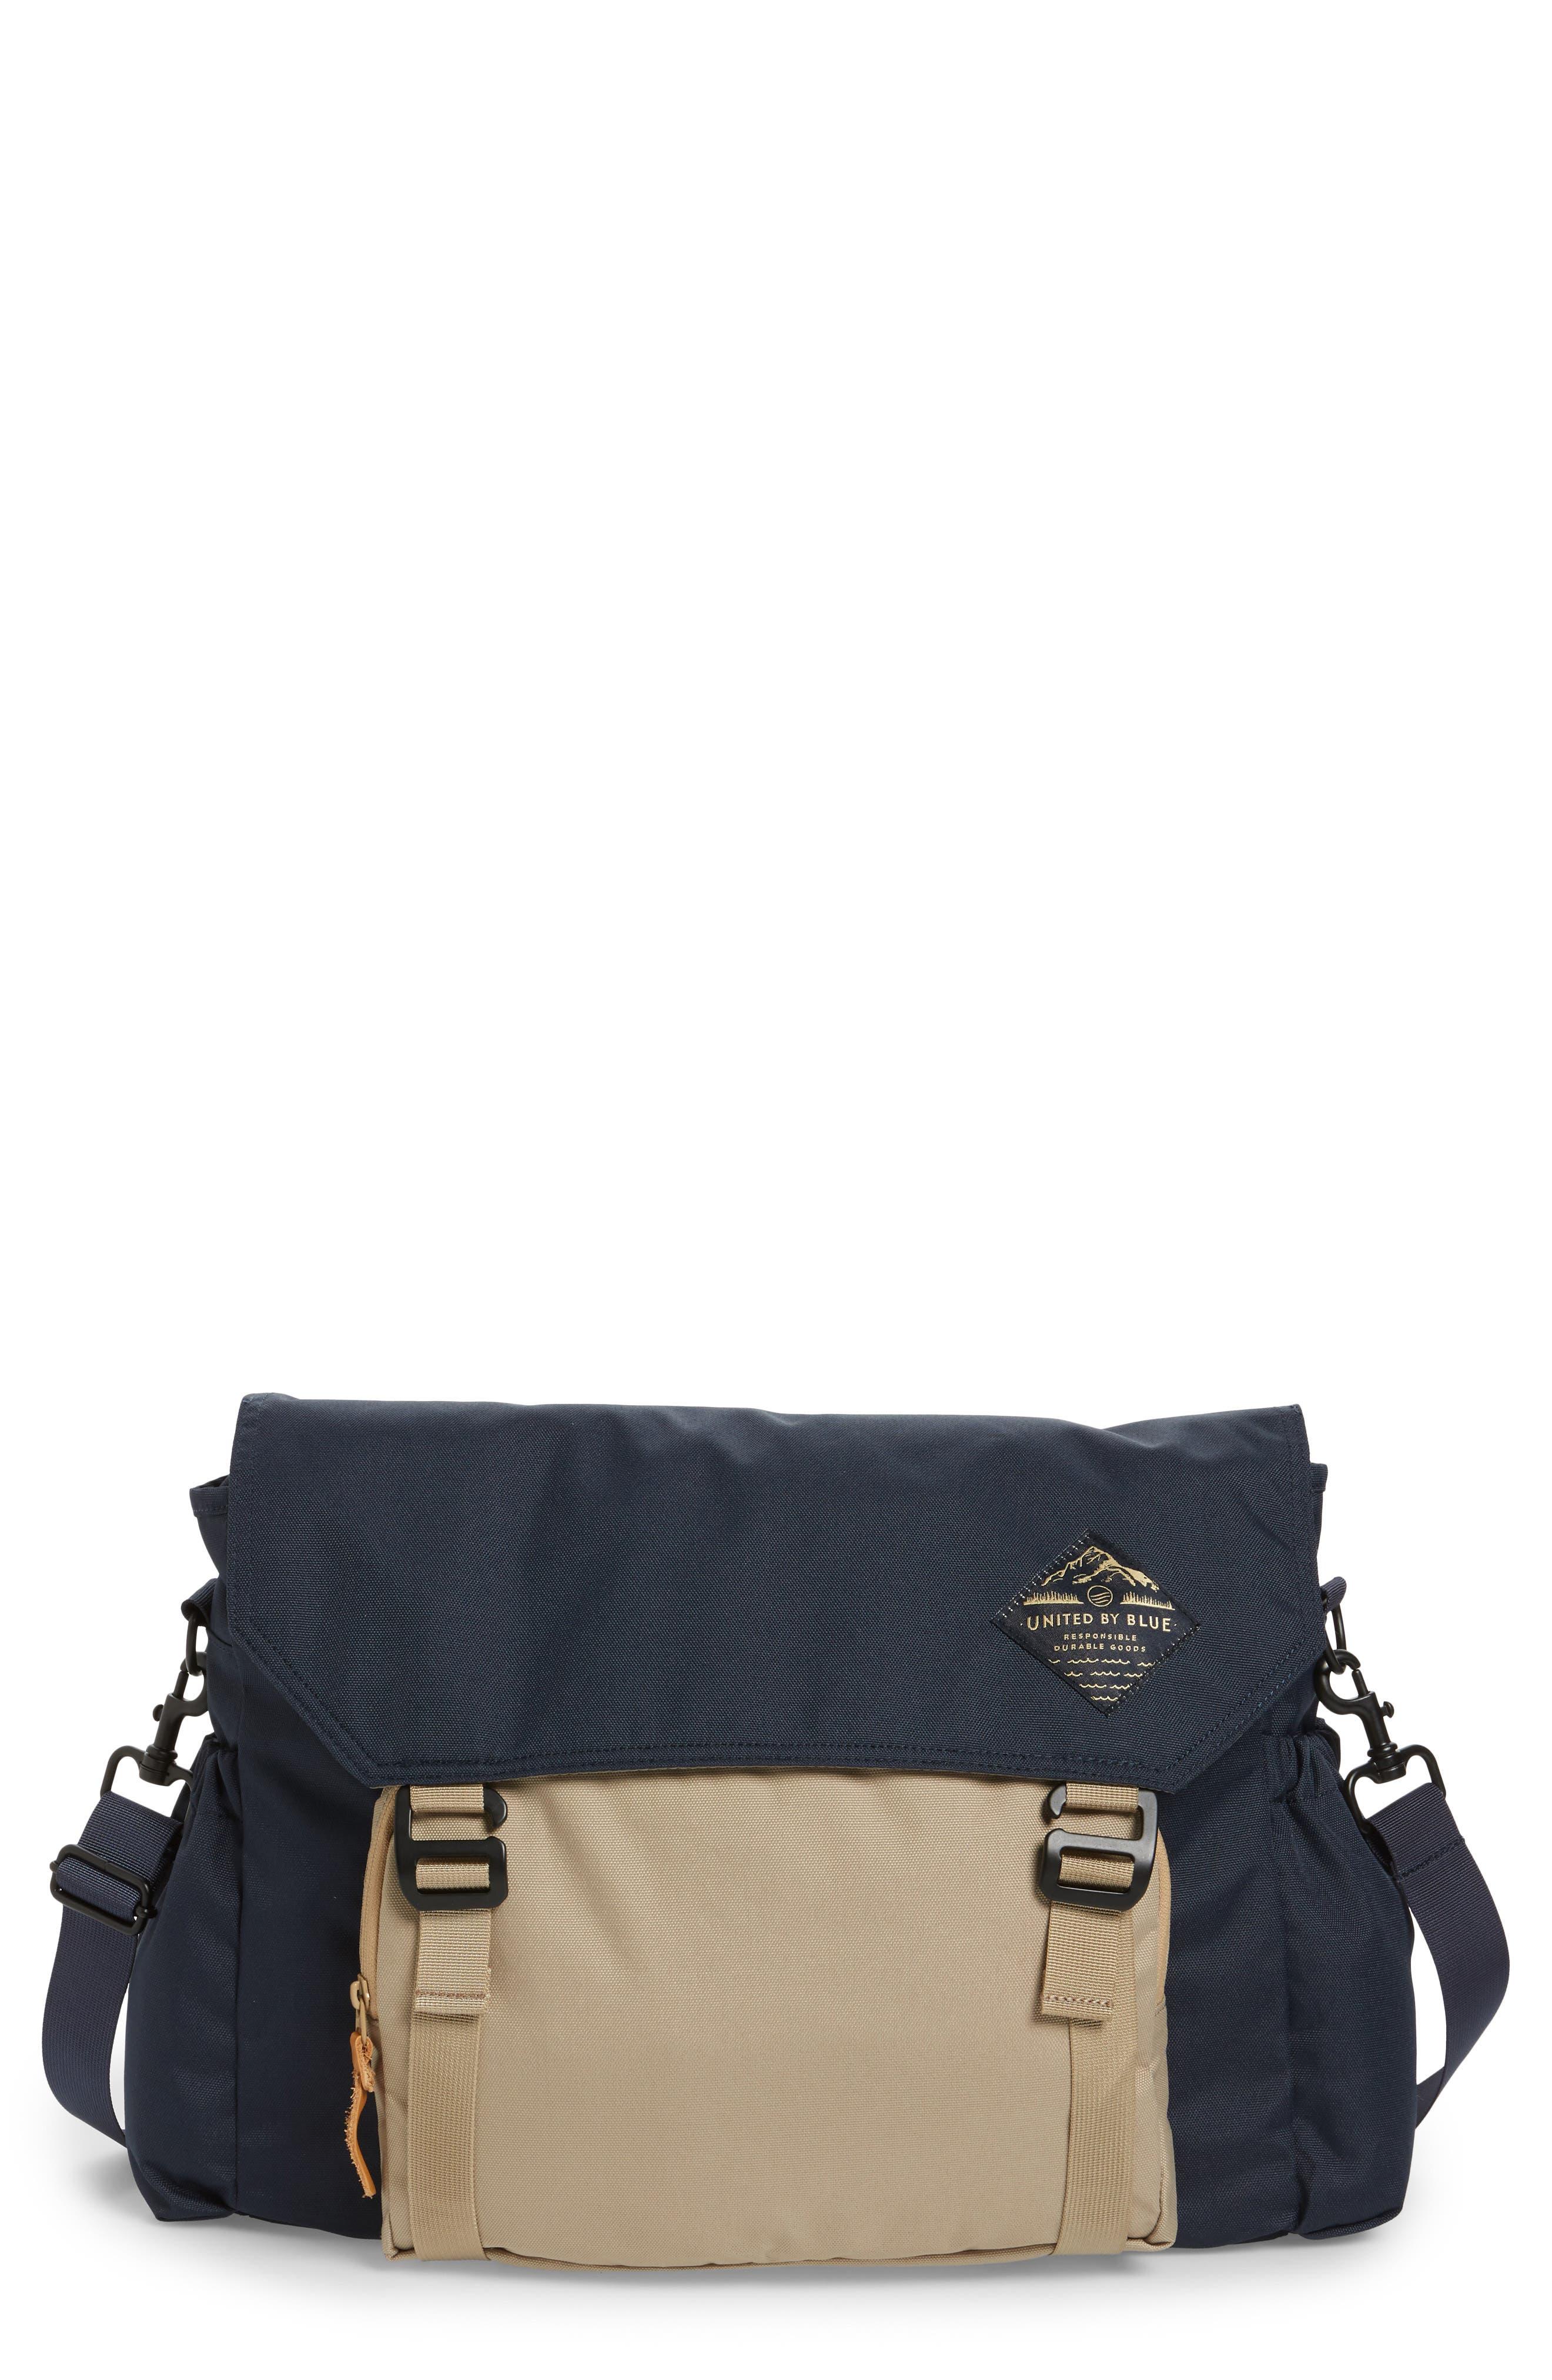 Crossridge Messenger Bag,                         Main,                         color, Navy/ Tan